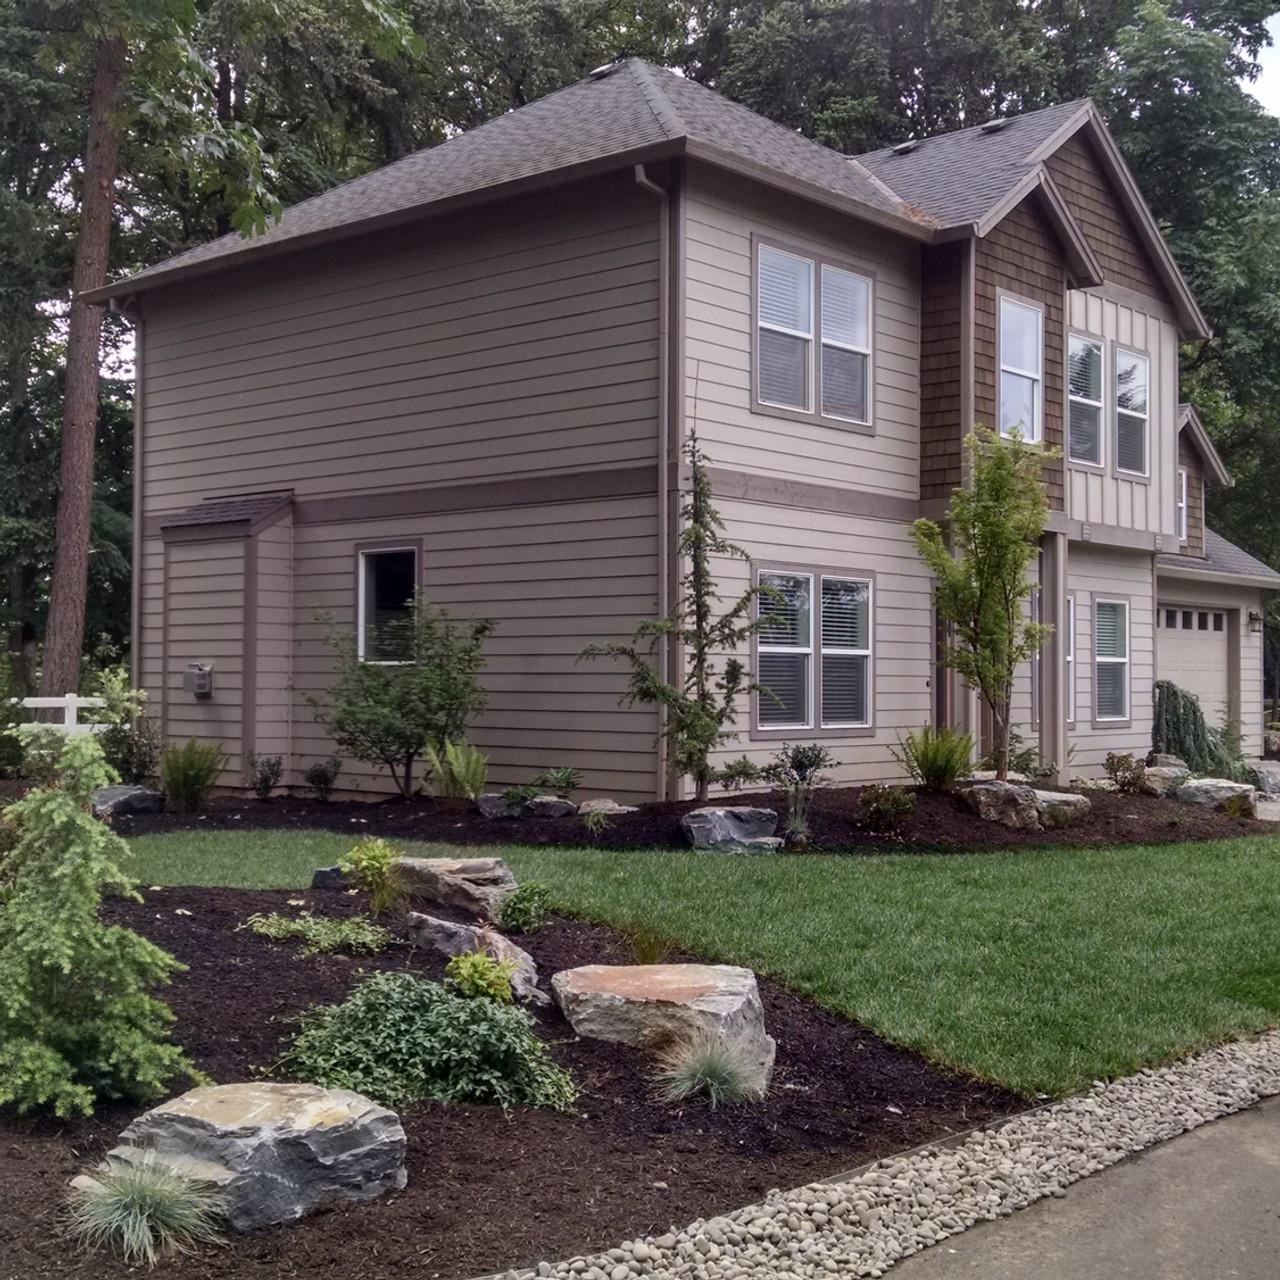 Landscaping, Side View.jpg